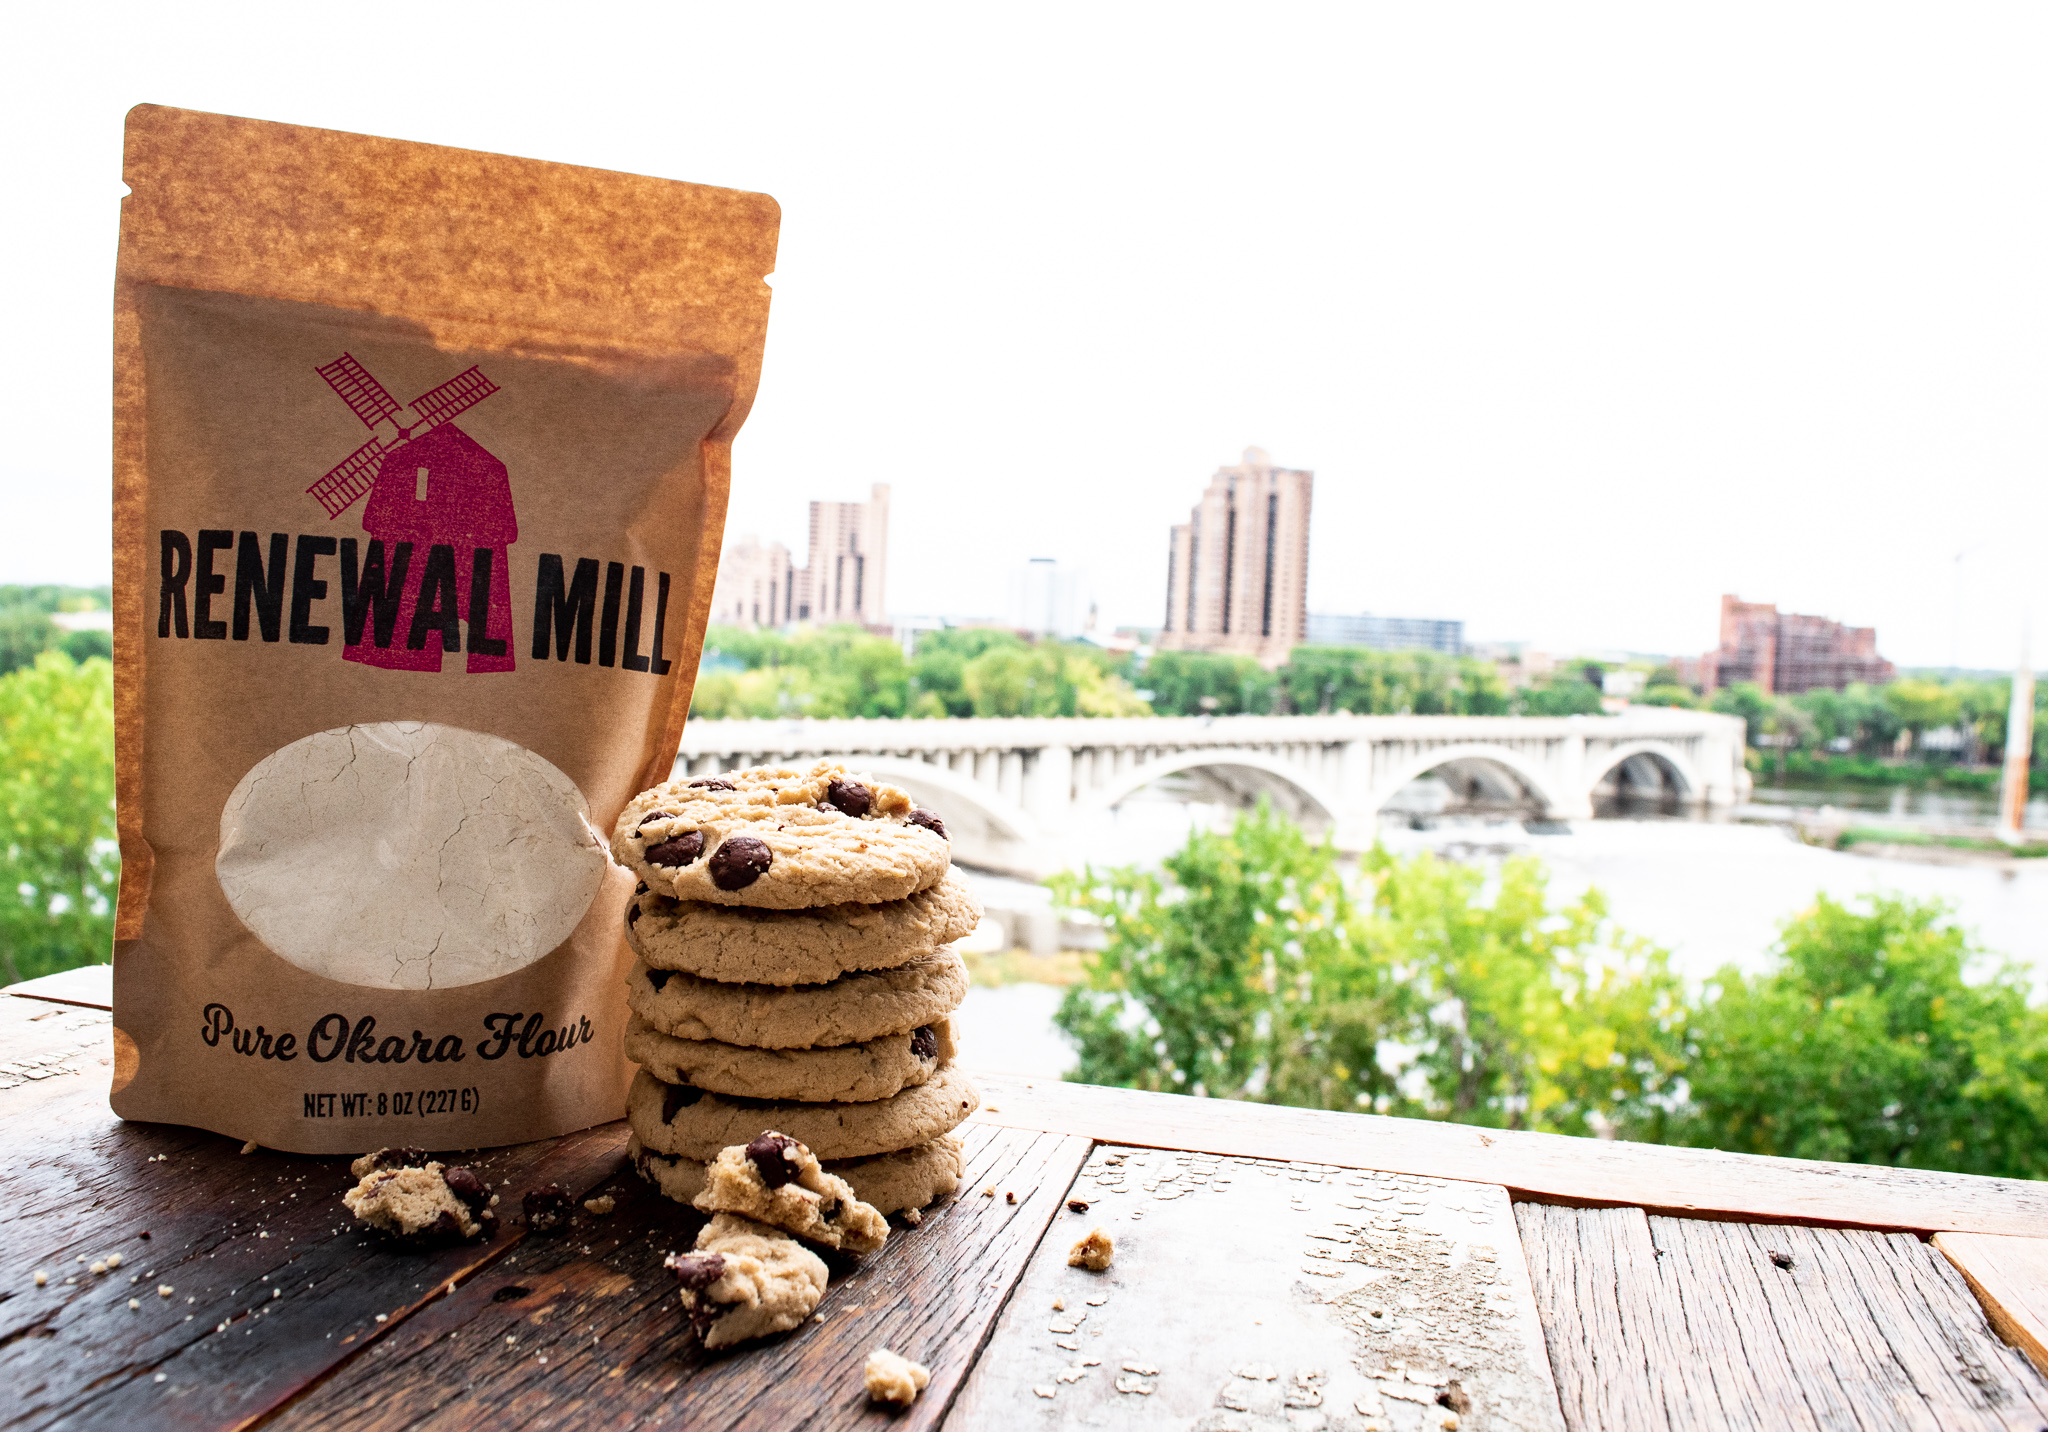 Renewal Mill Products.jpg